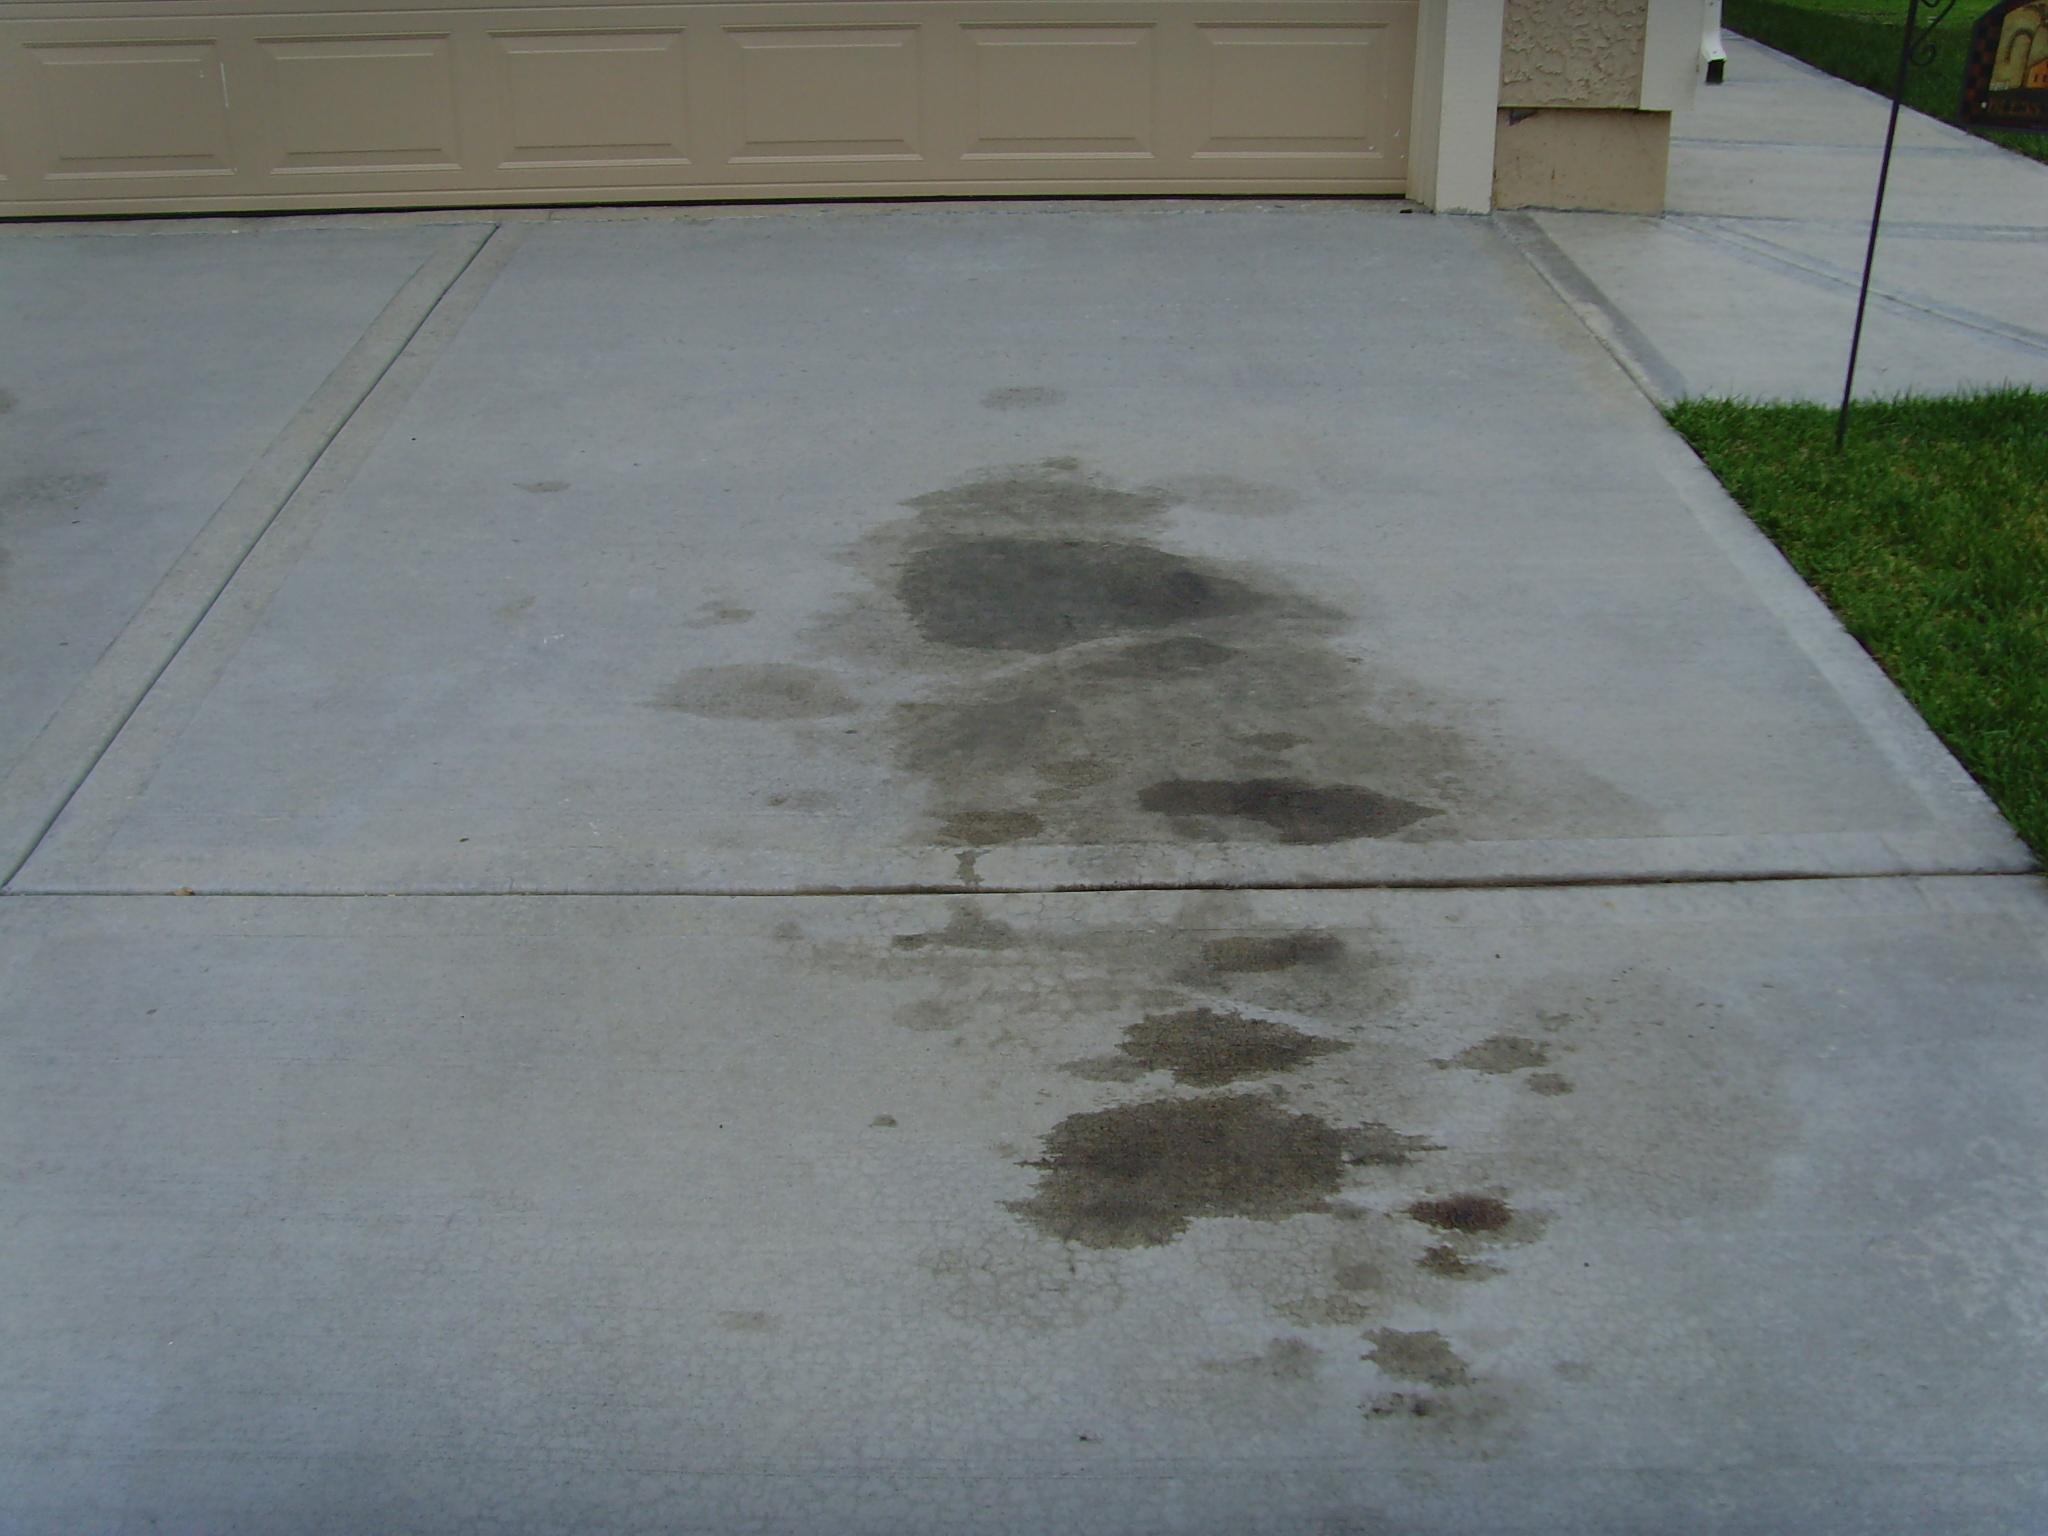 Driveway-oil-stain-www-sealgreen-com.jpg